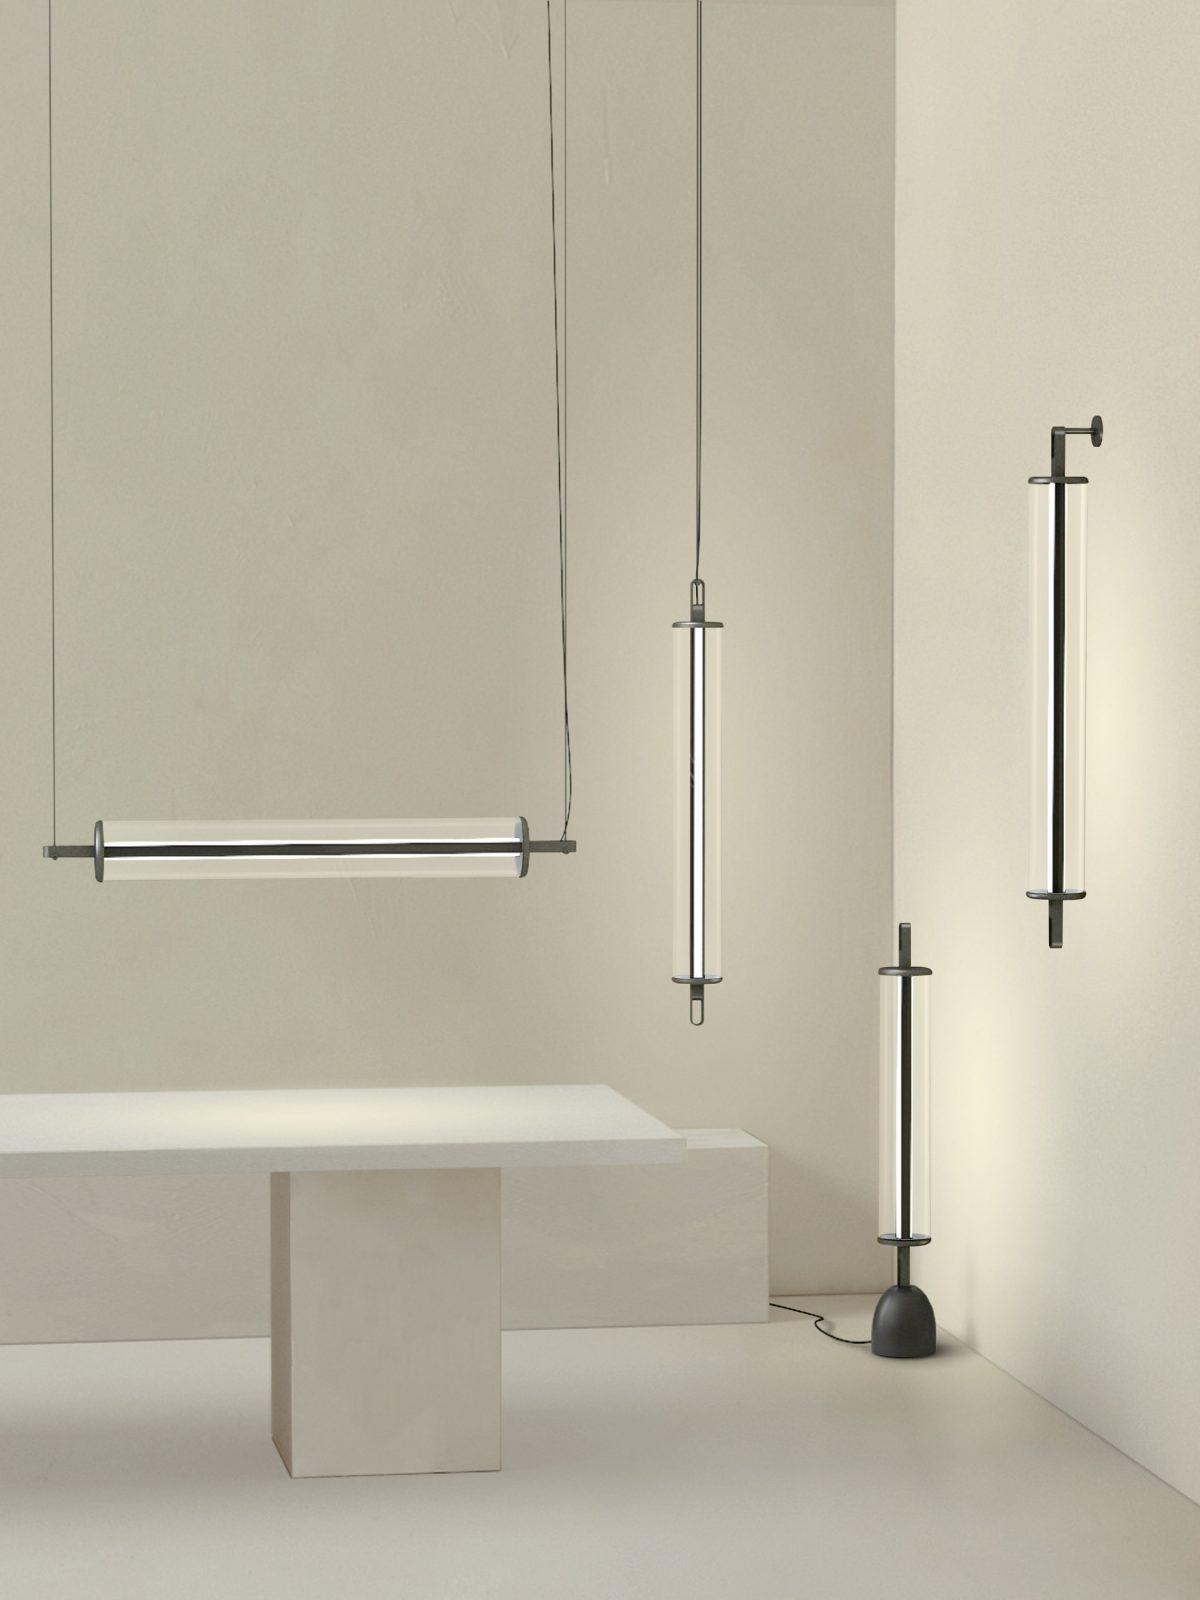 Fine Lumens 与西涛设计工作室合作的灯具系列 The Line collection 在上海时尚家居生活展上展出。